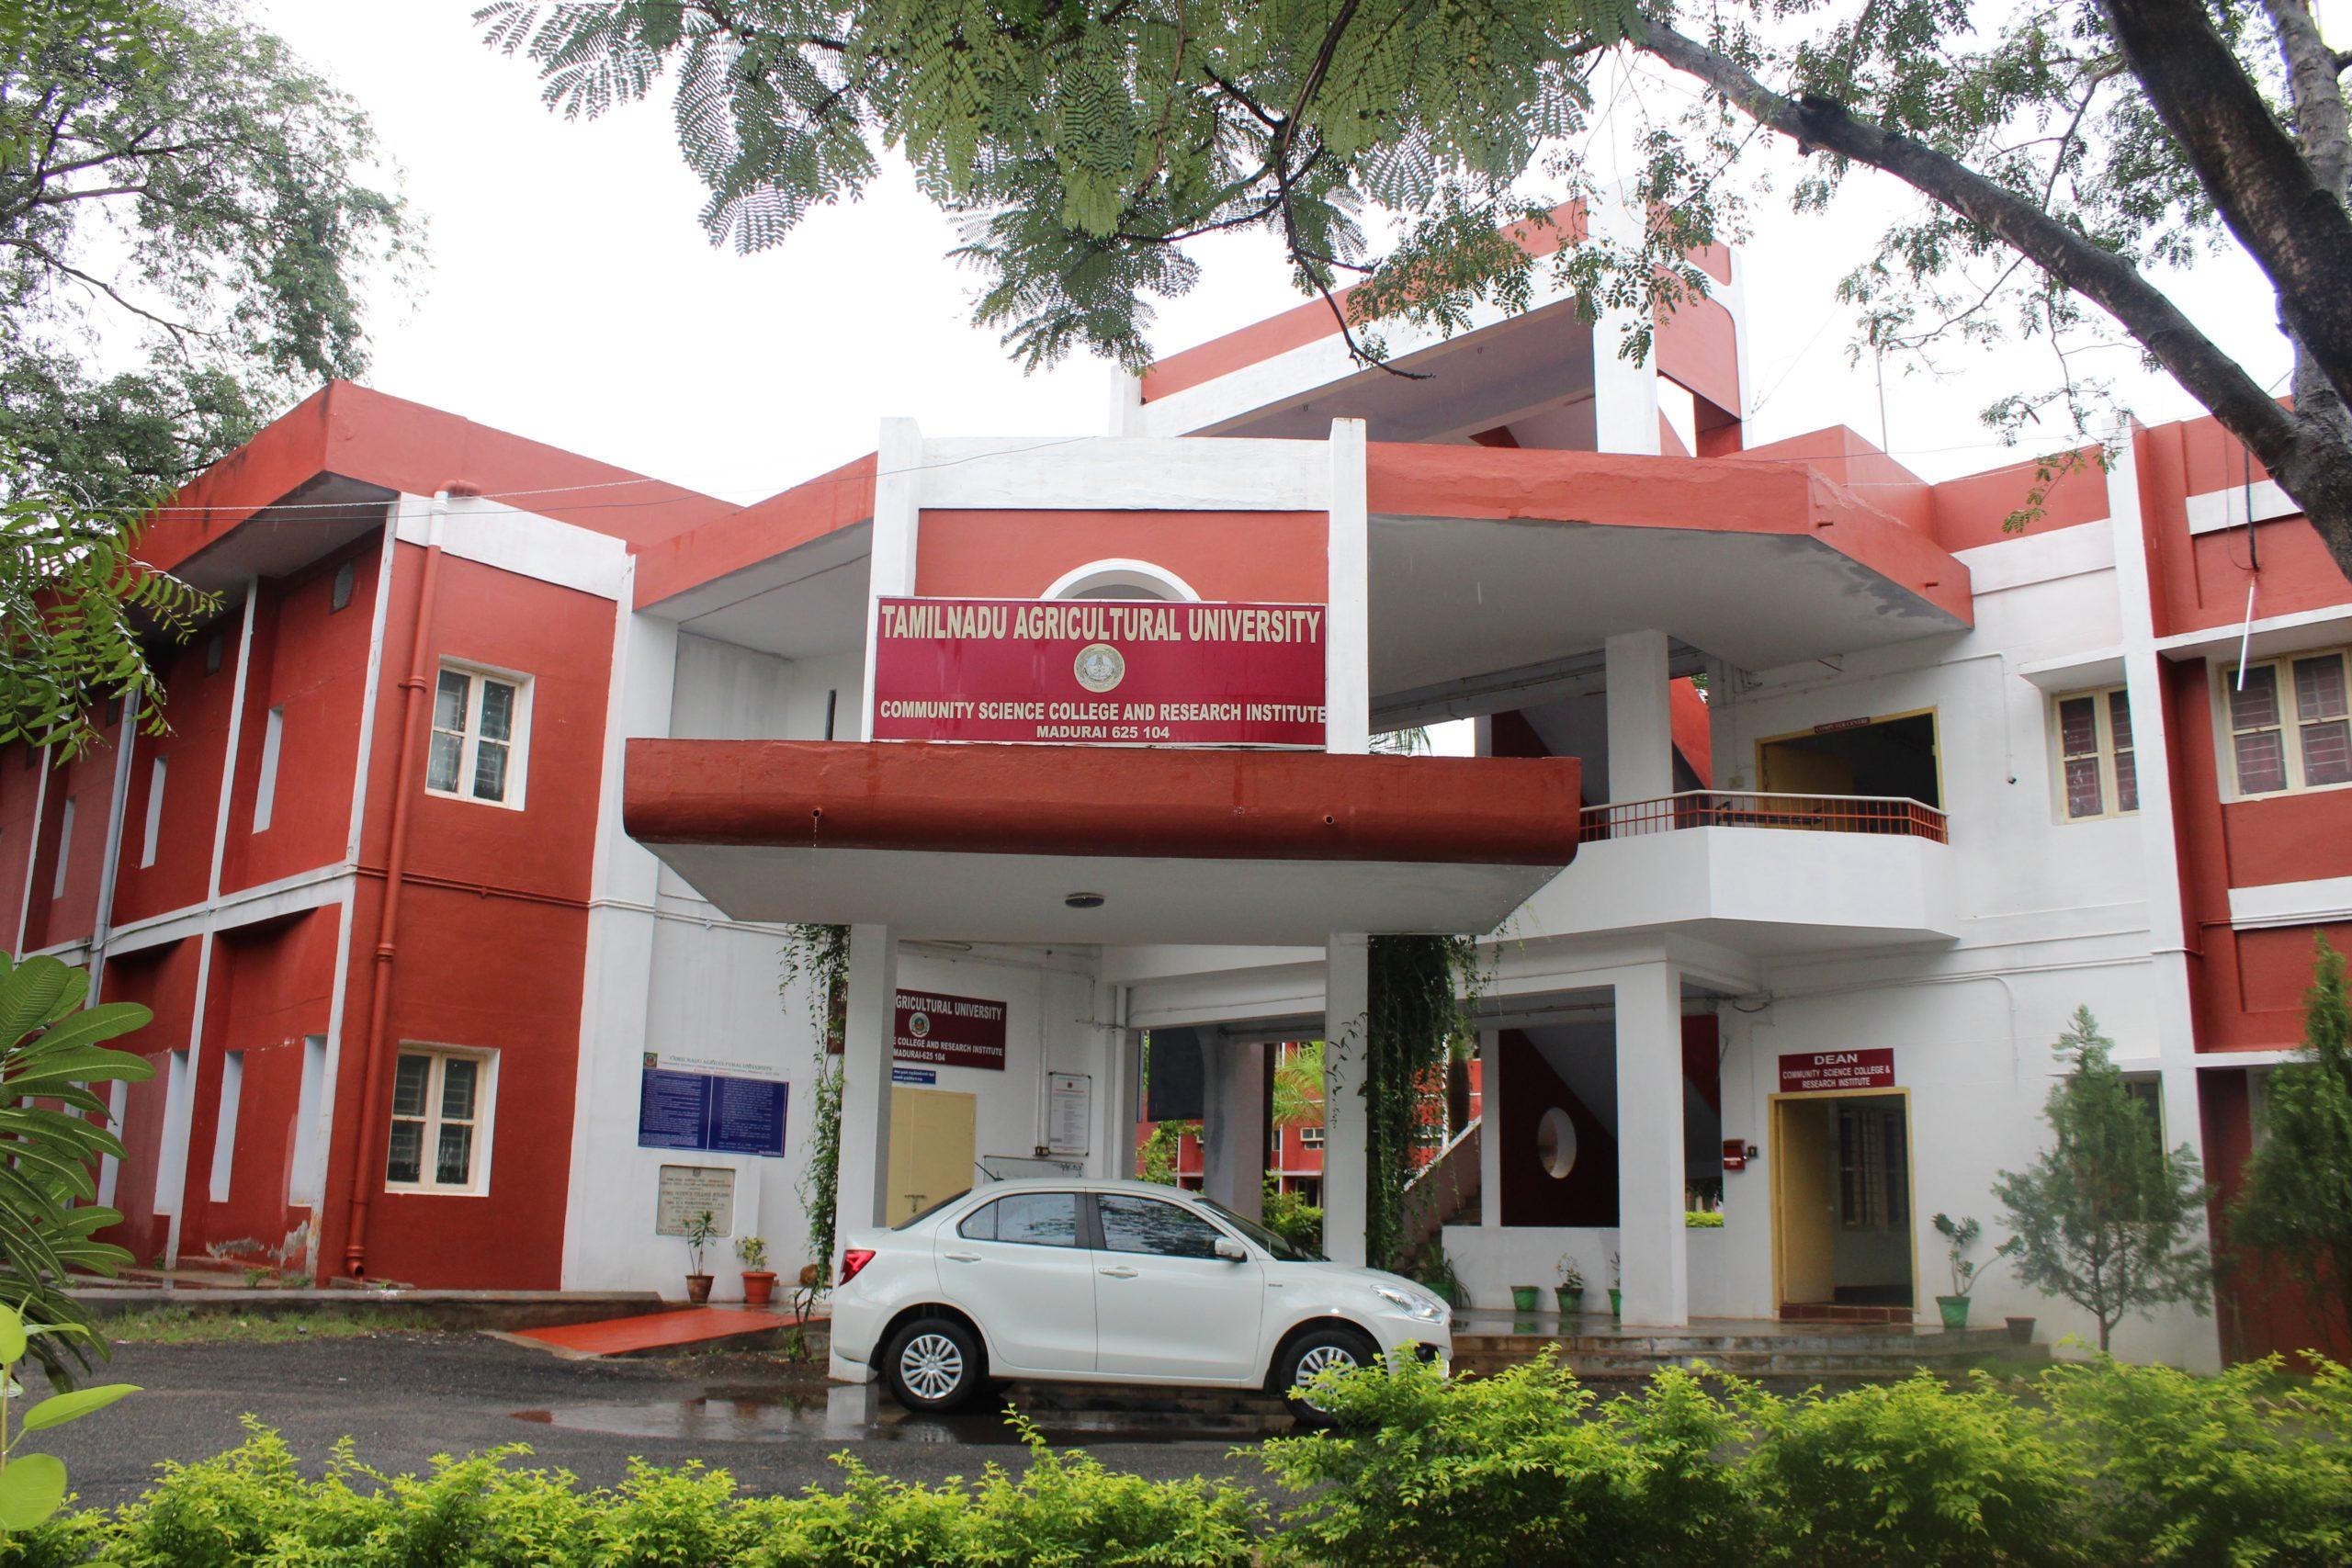 Community Science College and Research Institute, Madurai